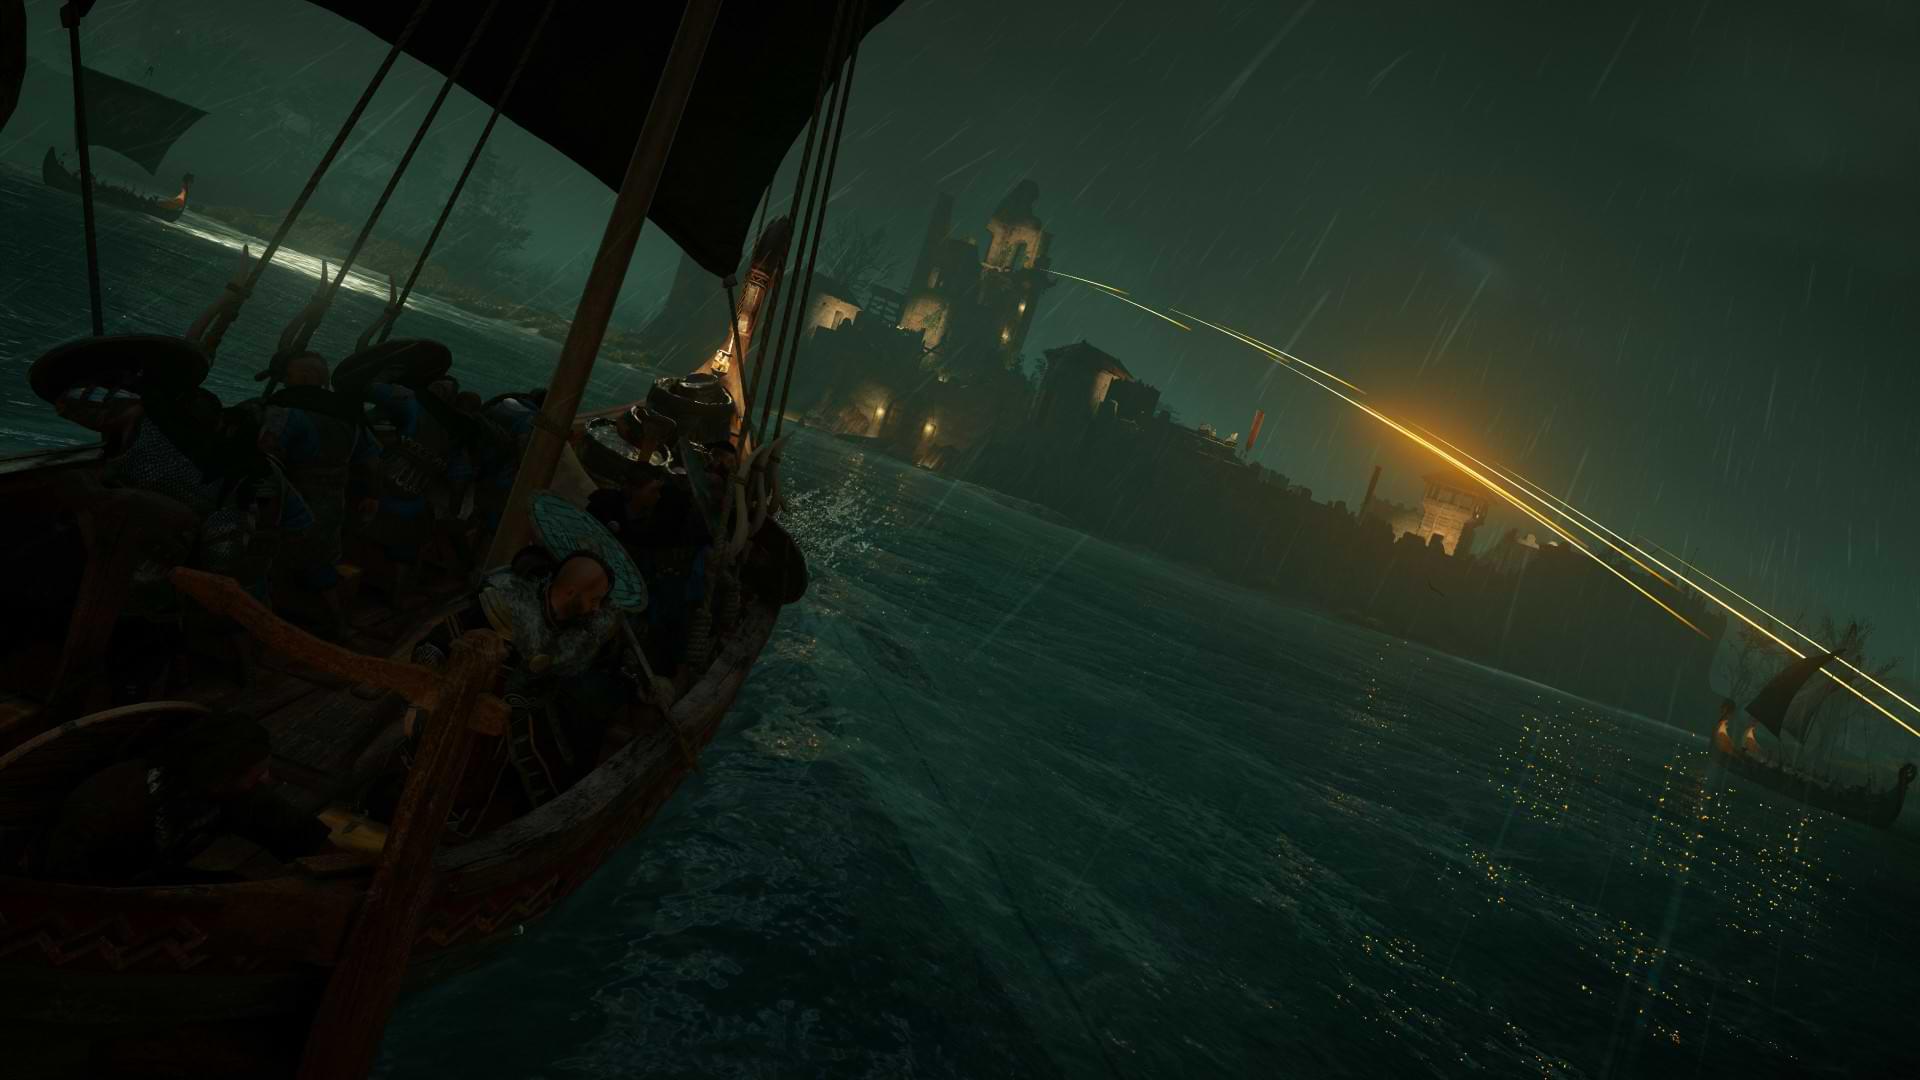 Assassin's Creed Valhalla - Storm